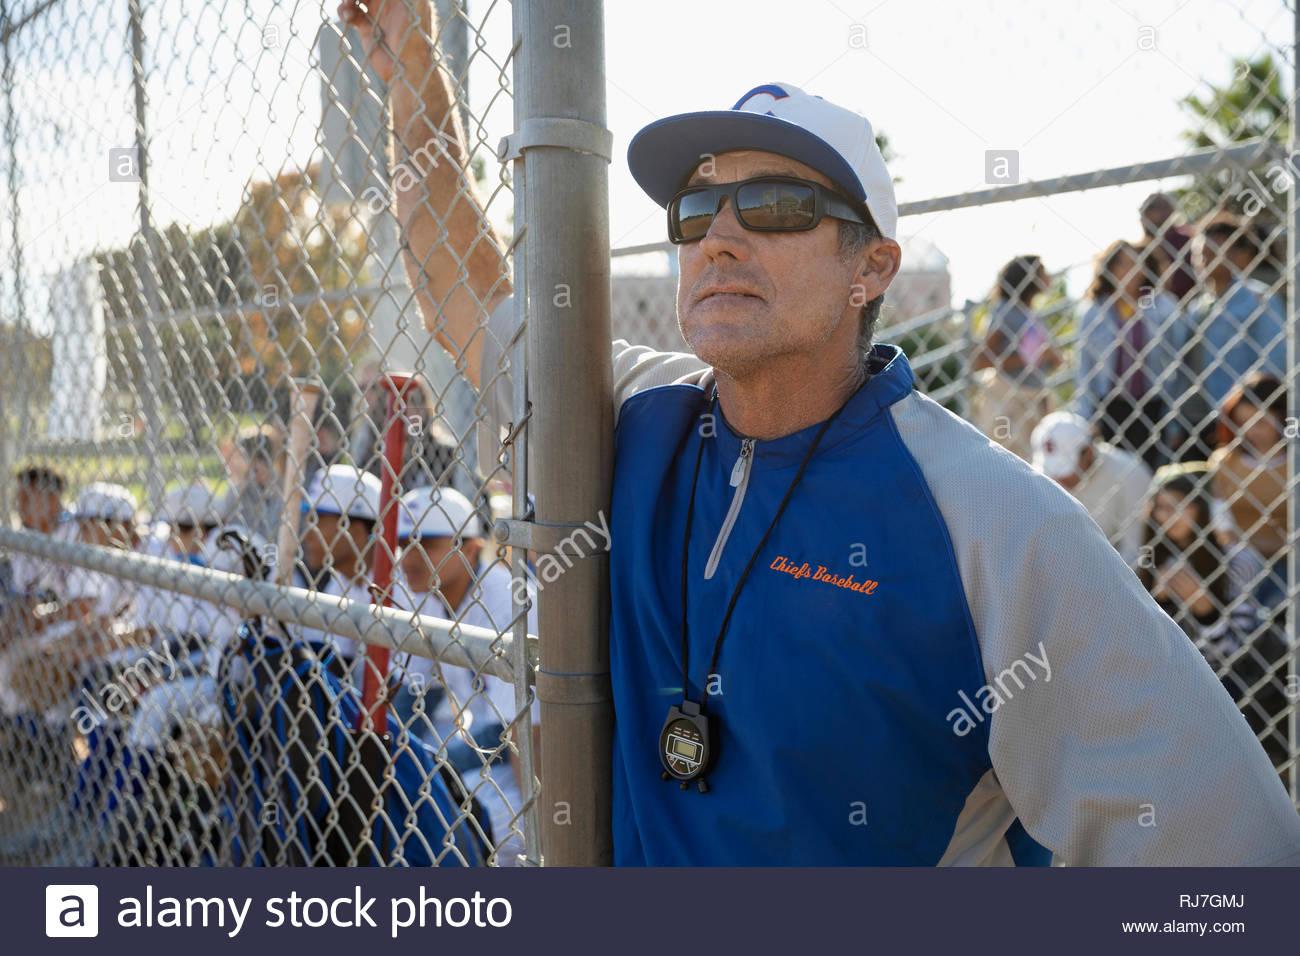 Entraîneur de baseball ciblé leaning on fence Photo Stock